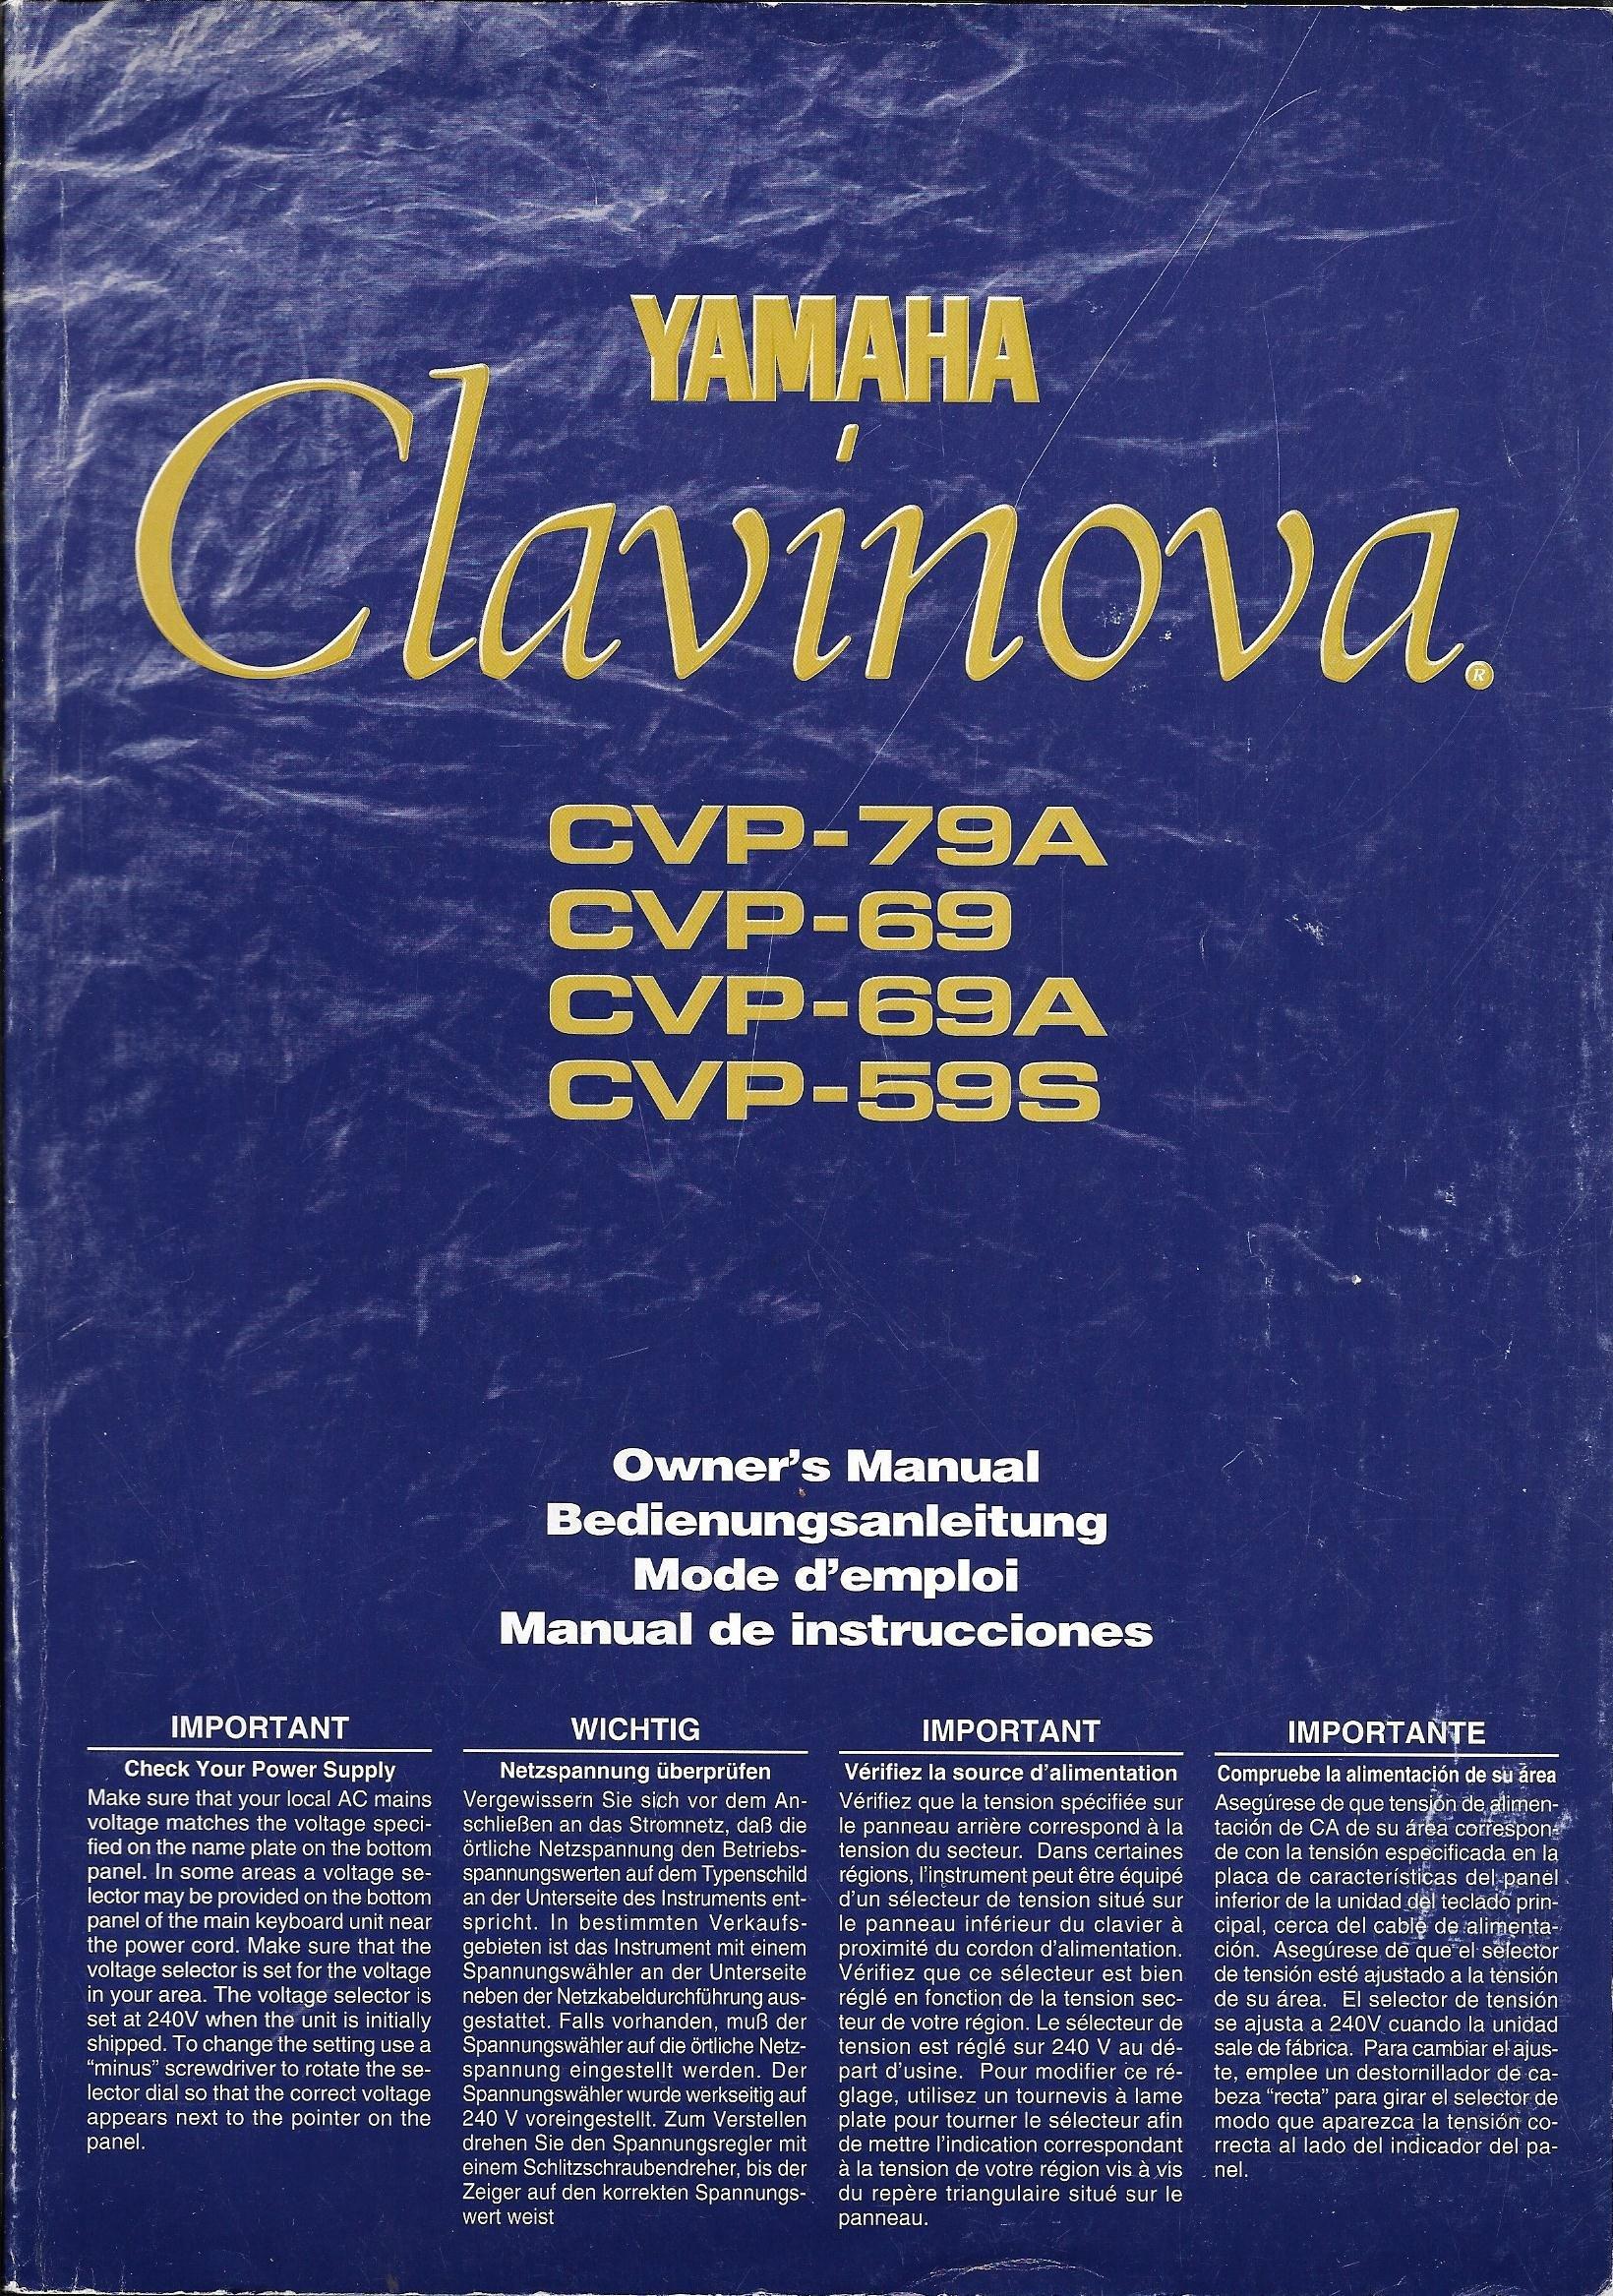 yamaha clavinova owner s manual cvp 79a cvp 69 cvp 69a cvp 59s rh amazon com yamaha clavinova service manual pdf yamaha clavinova user manual